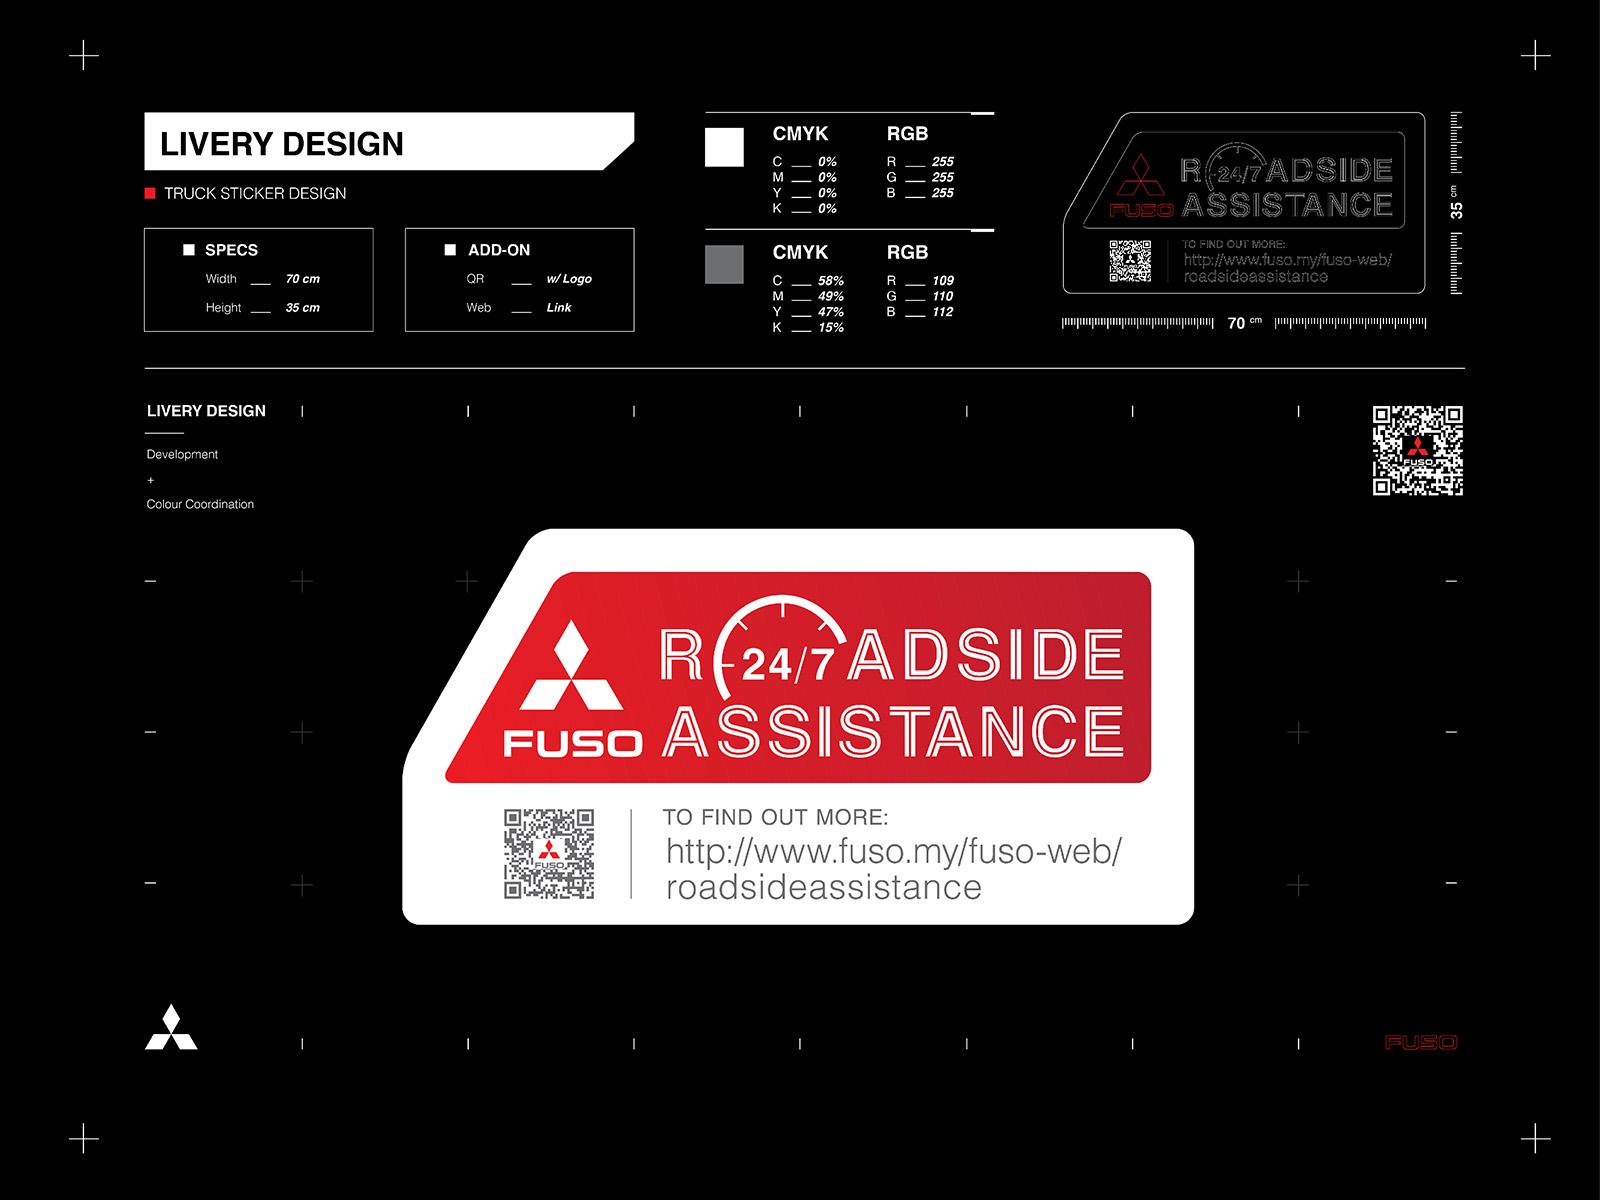 apaper_fuso_24_hour_24hr_roadside_assistance_masthead-03.jpg